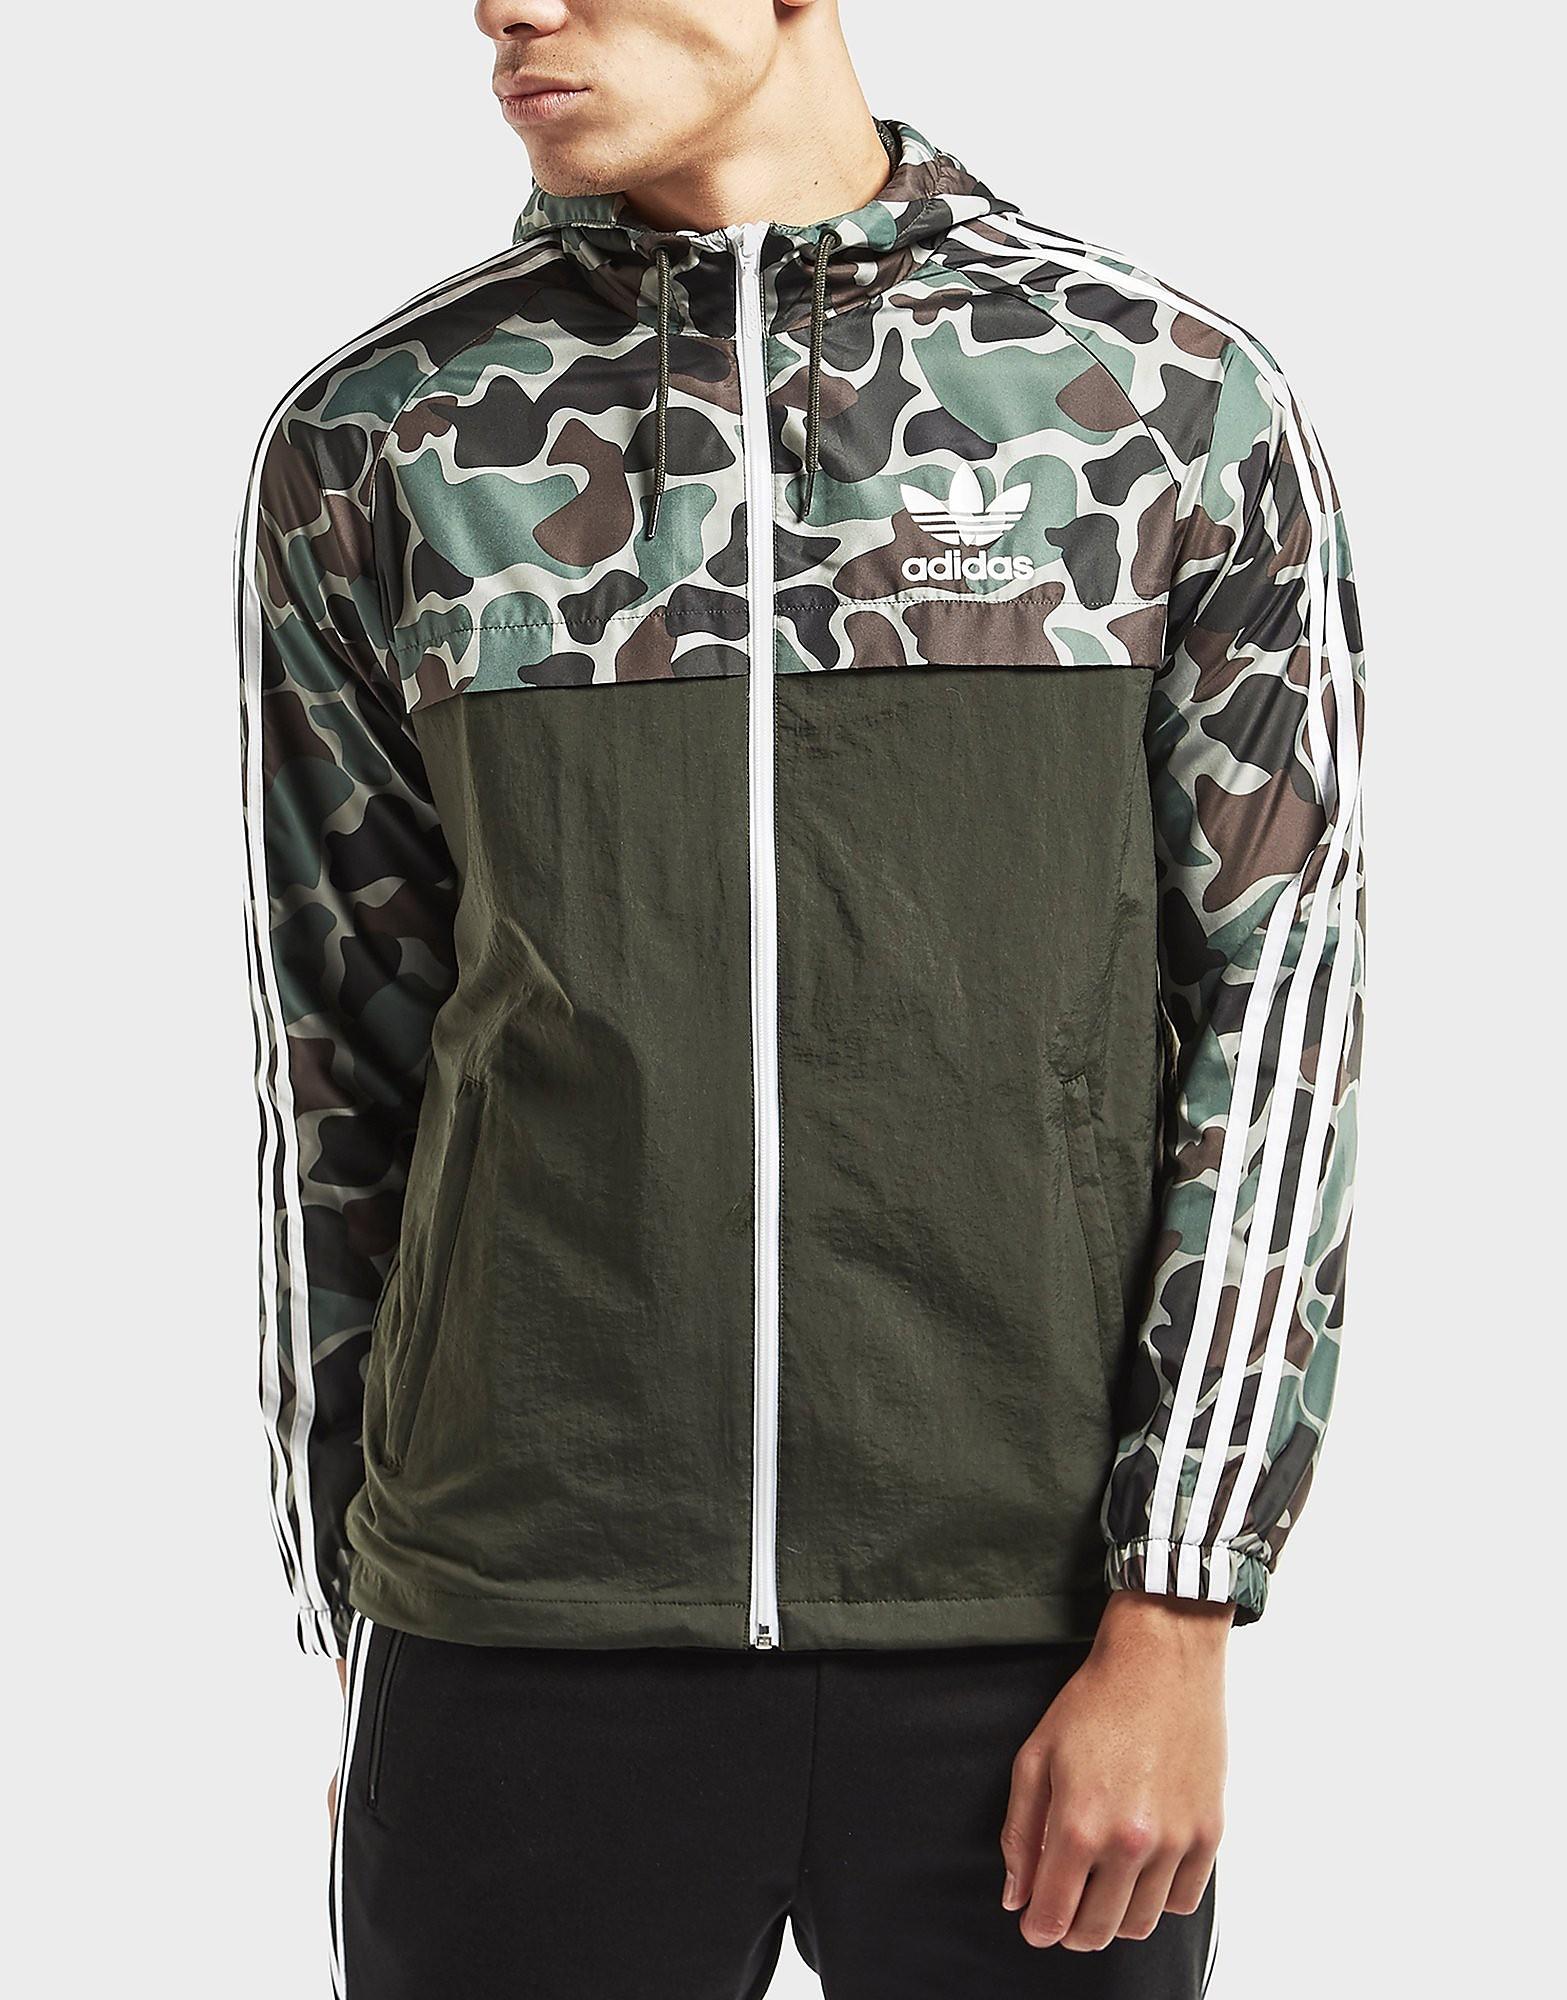 adidas Originals Windbreaker Lightweight Jacket